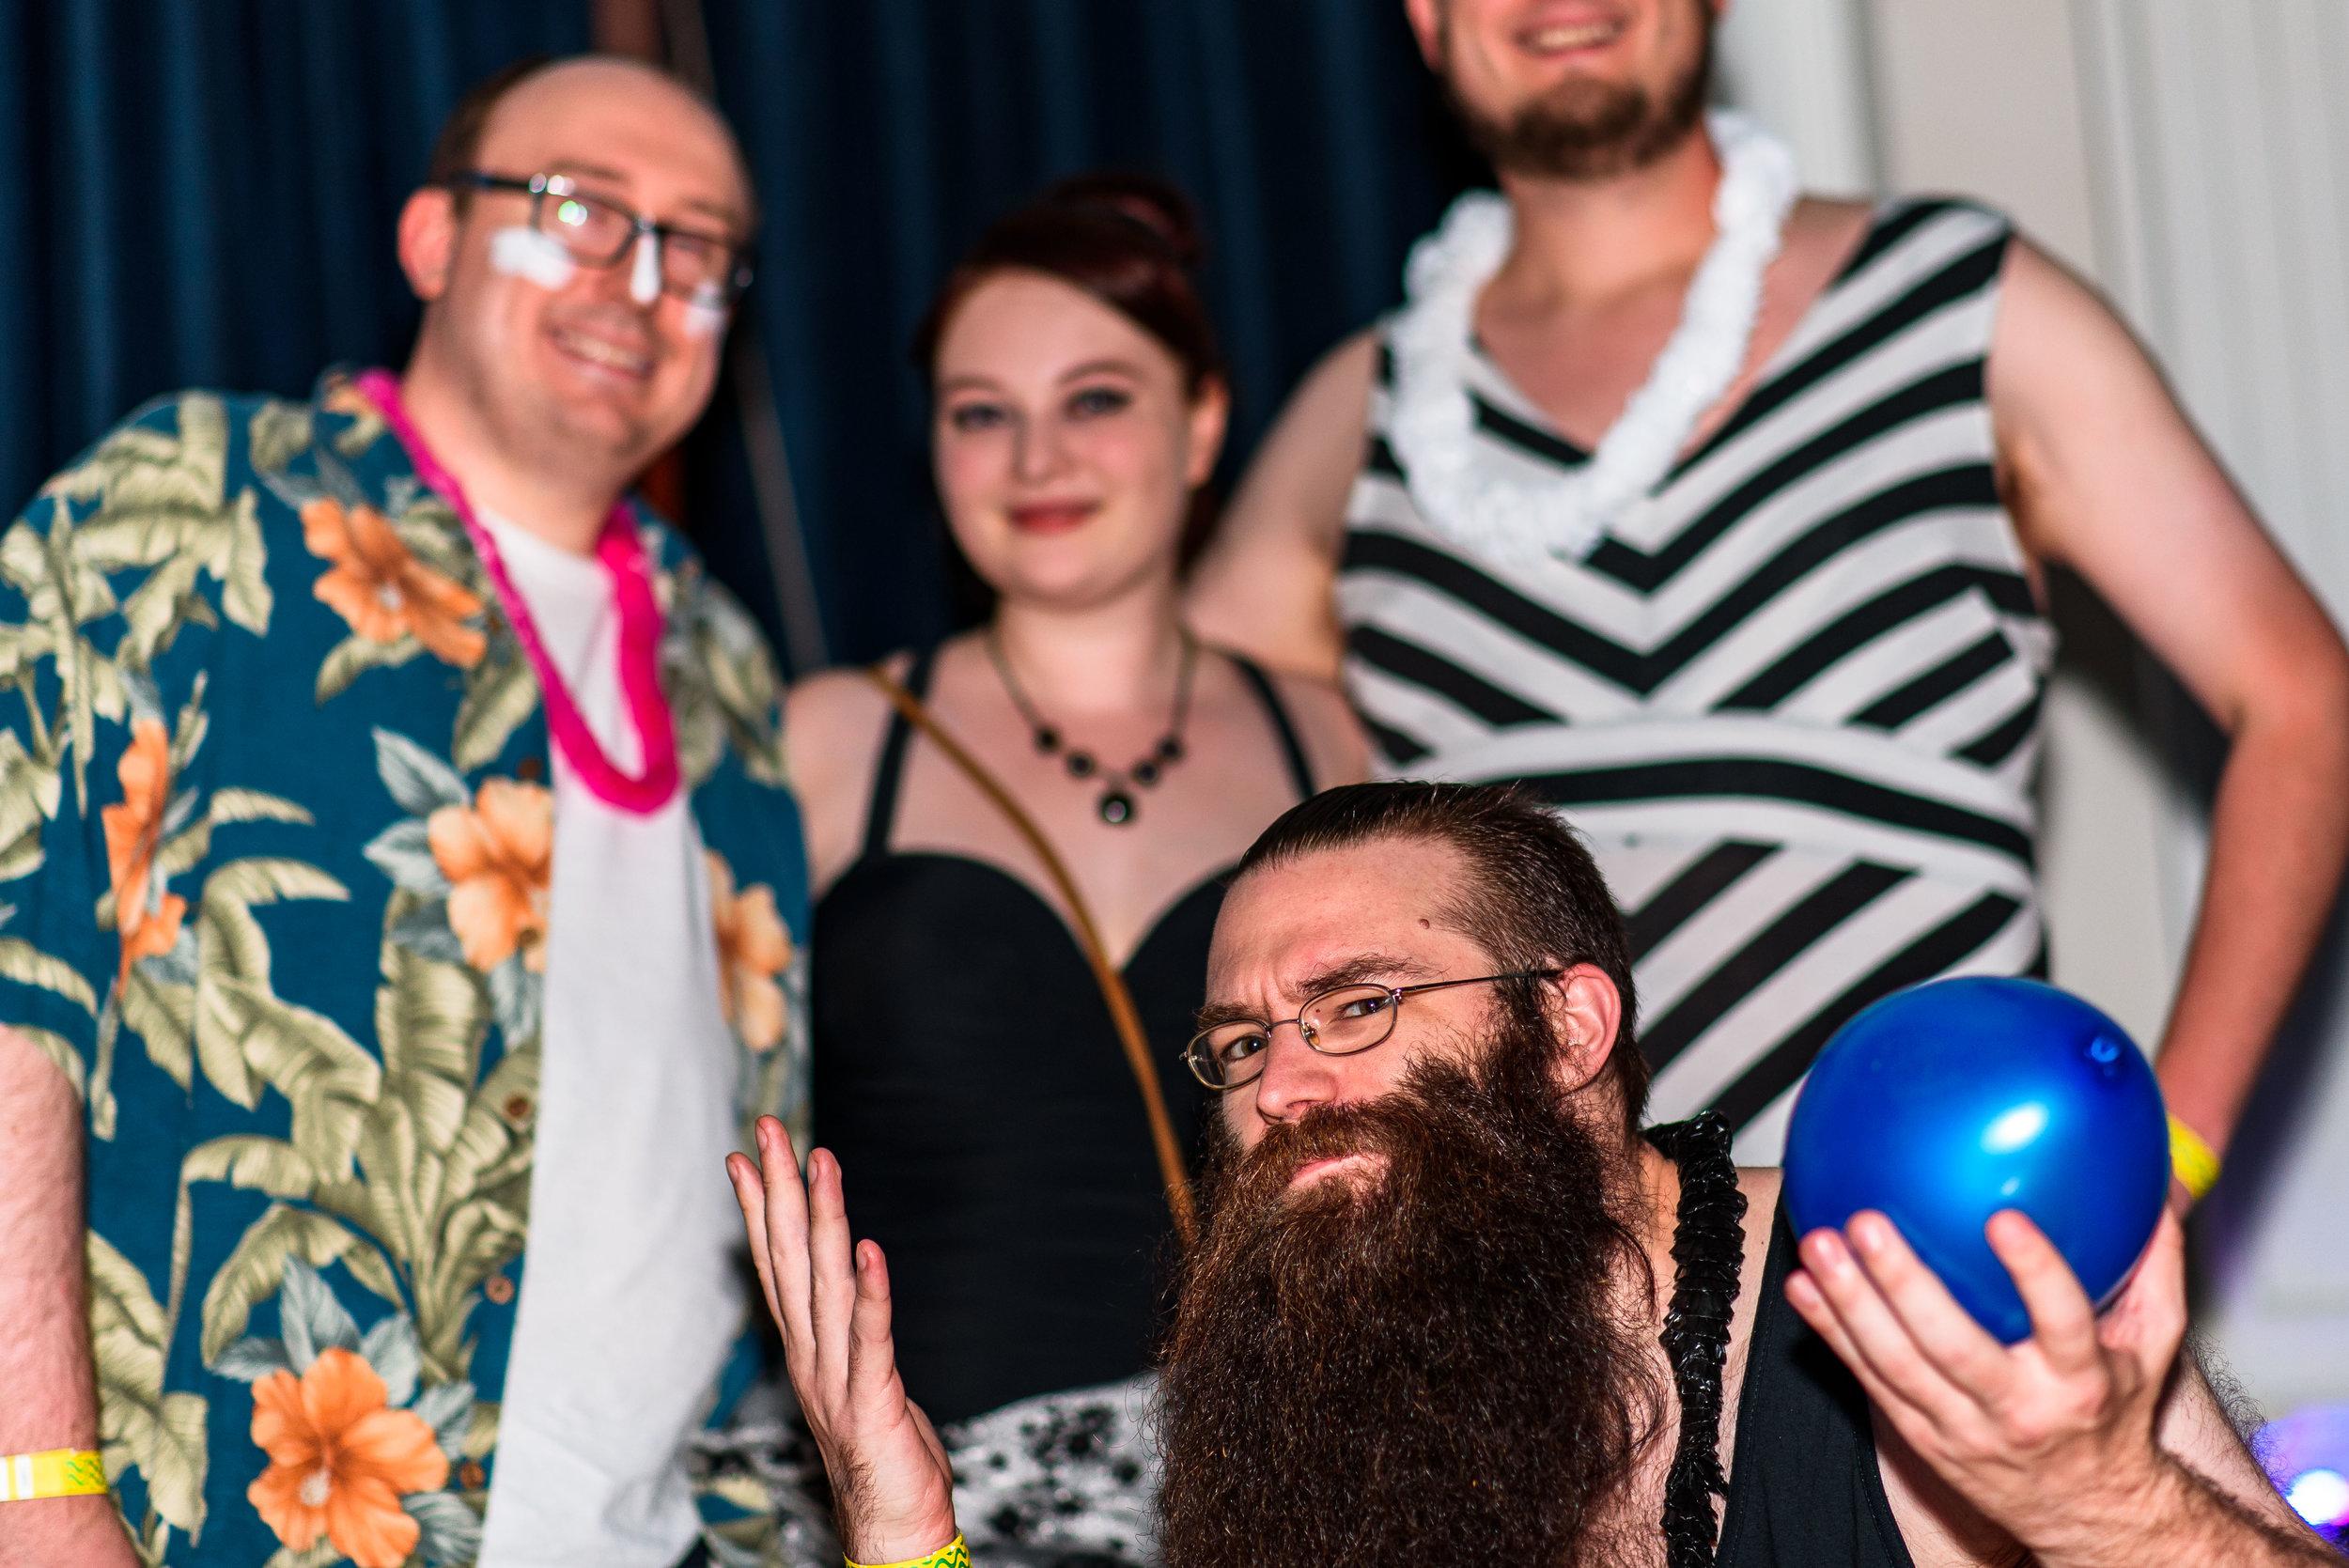 2019-TheHaven Club - Beach Party (12).jpg